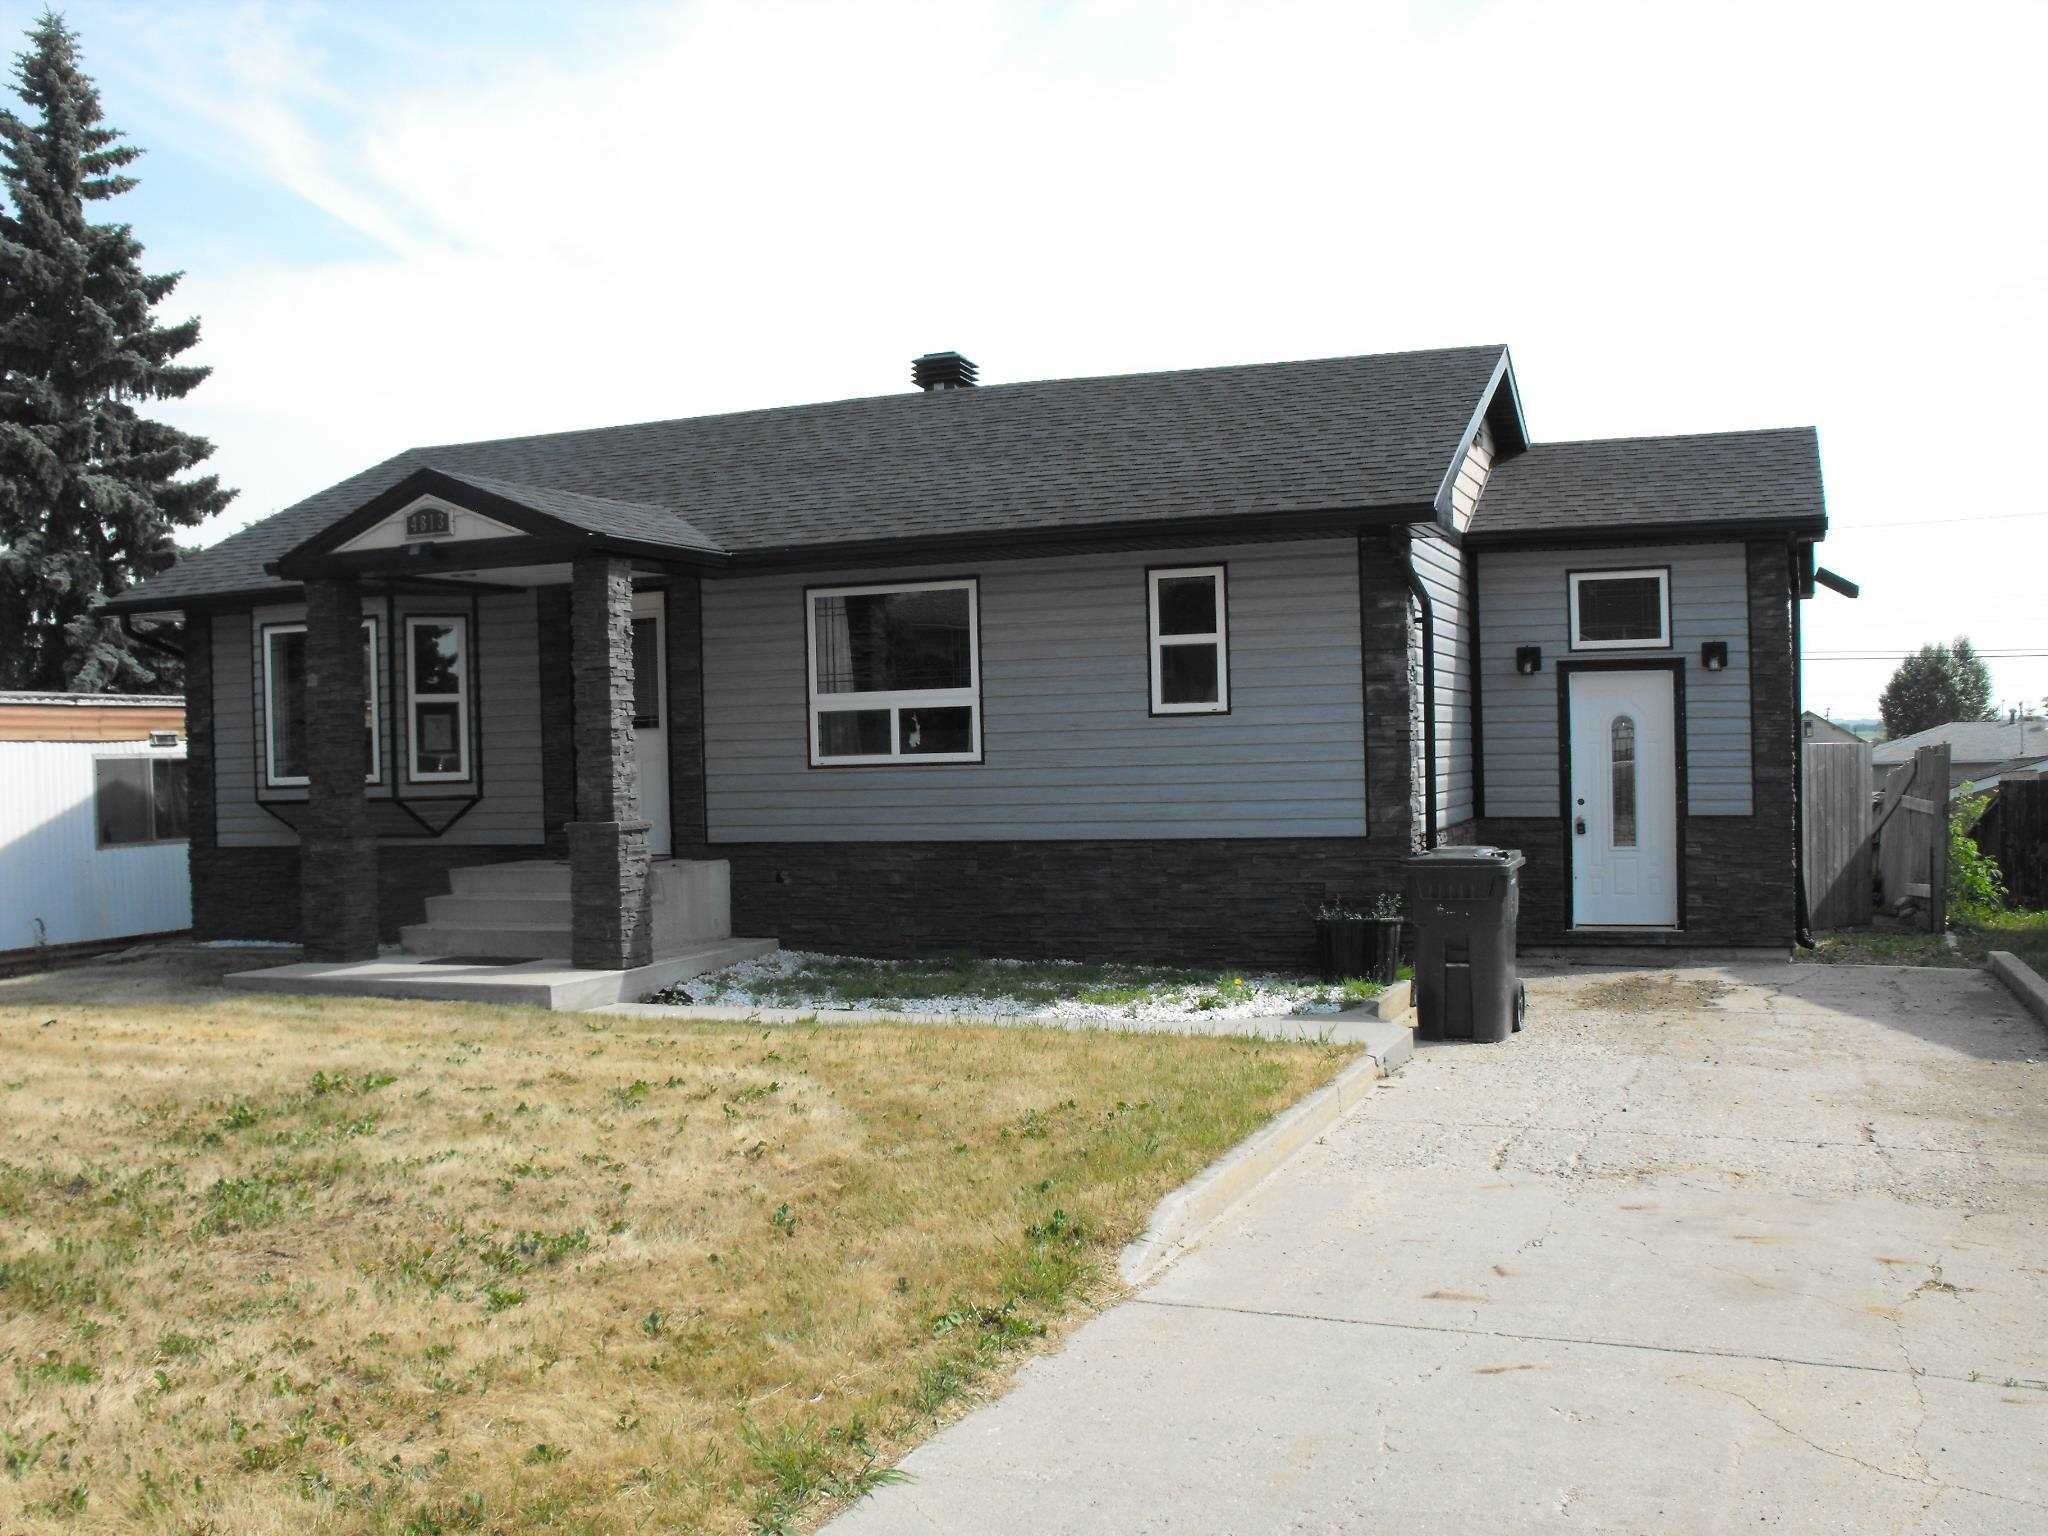 Main Photo: 4813 52 Avenue: Elk Point House for sale : MLS®# E4254406